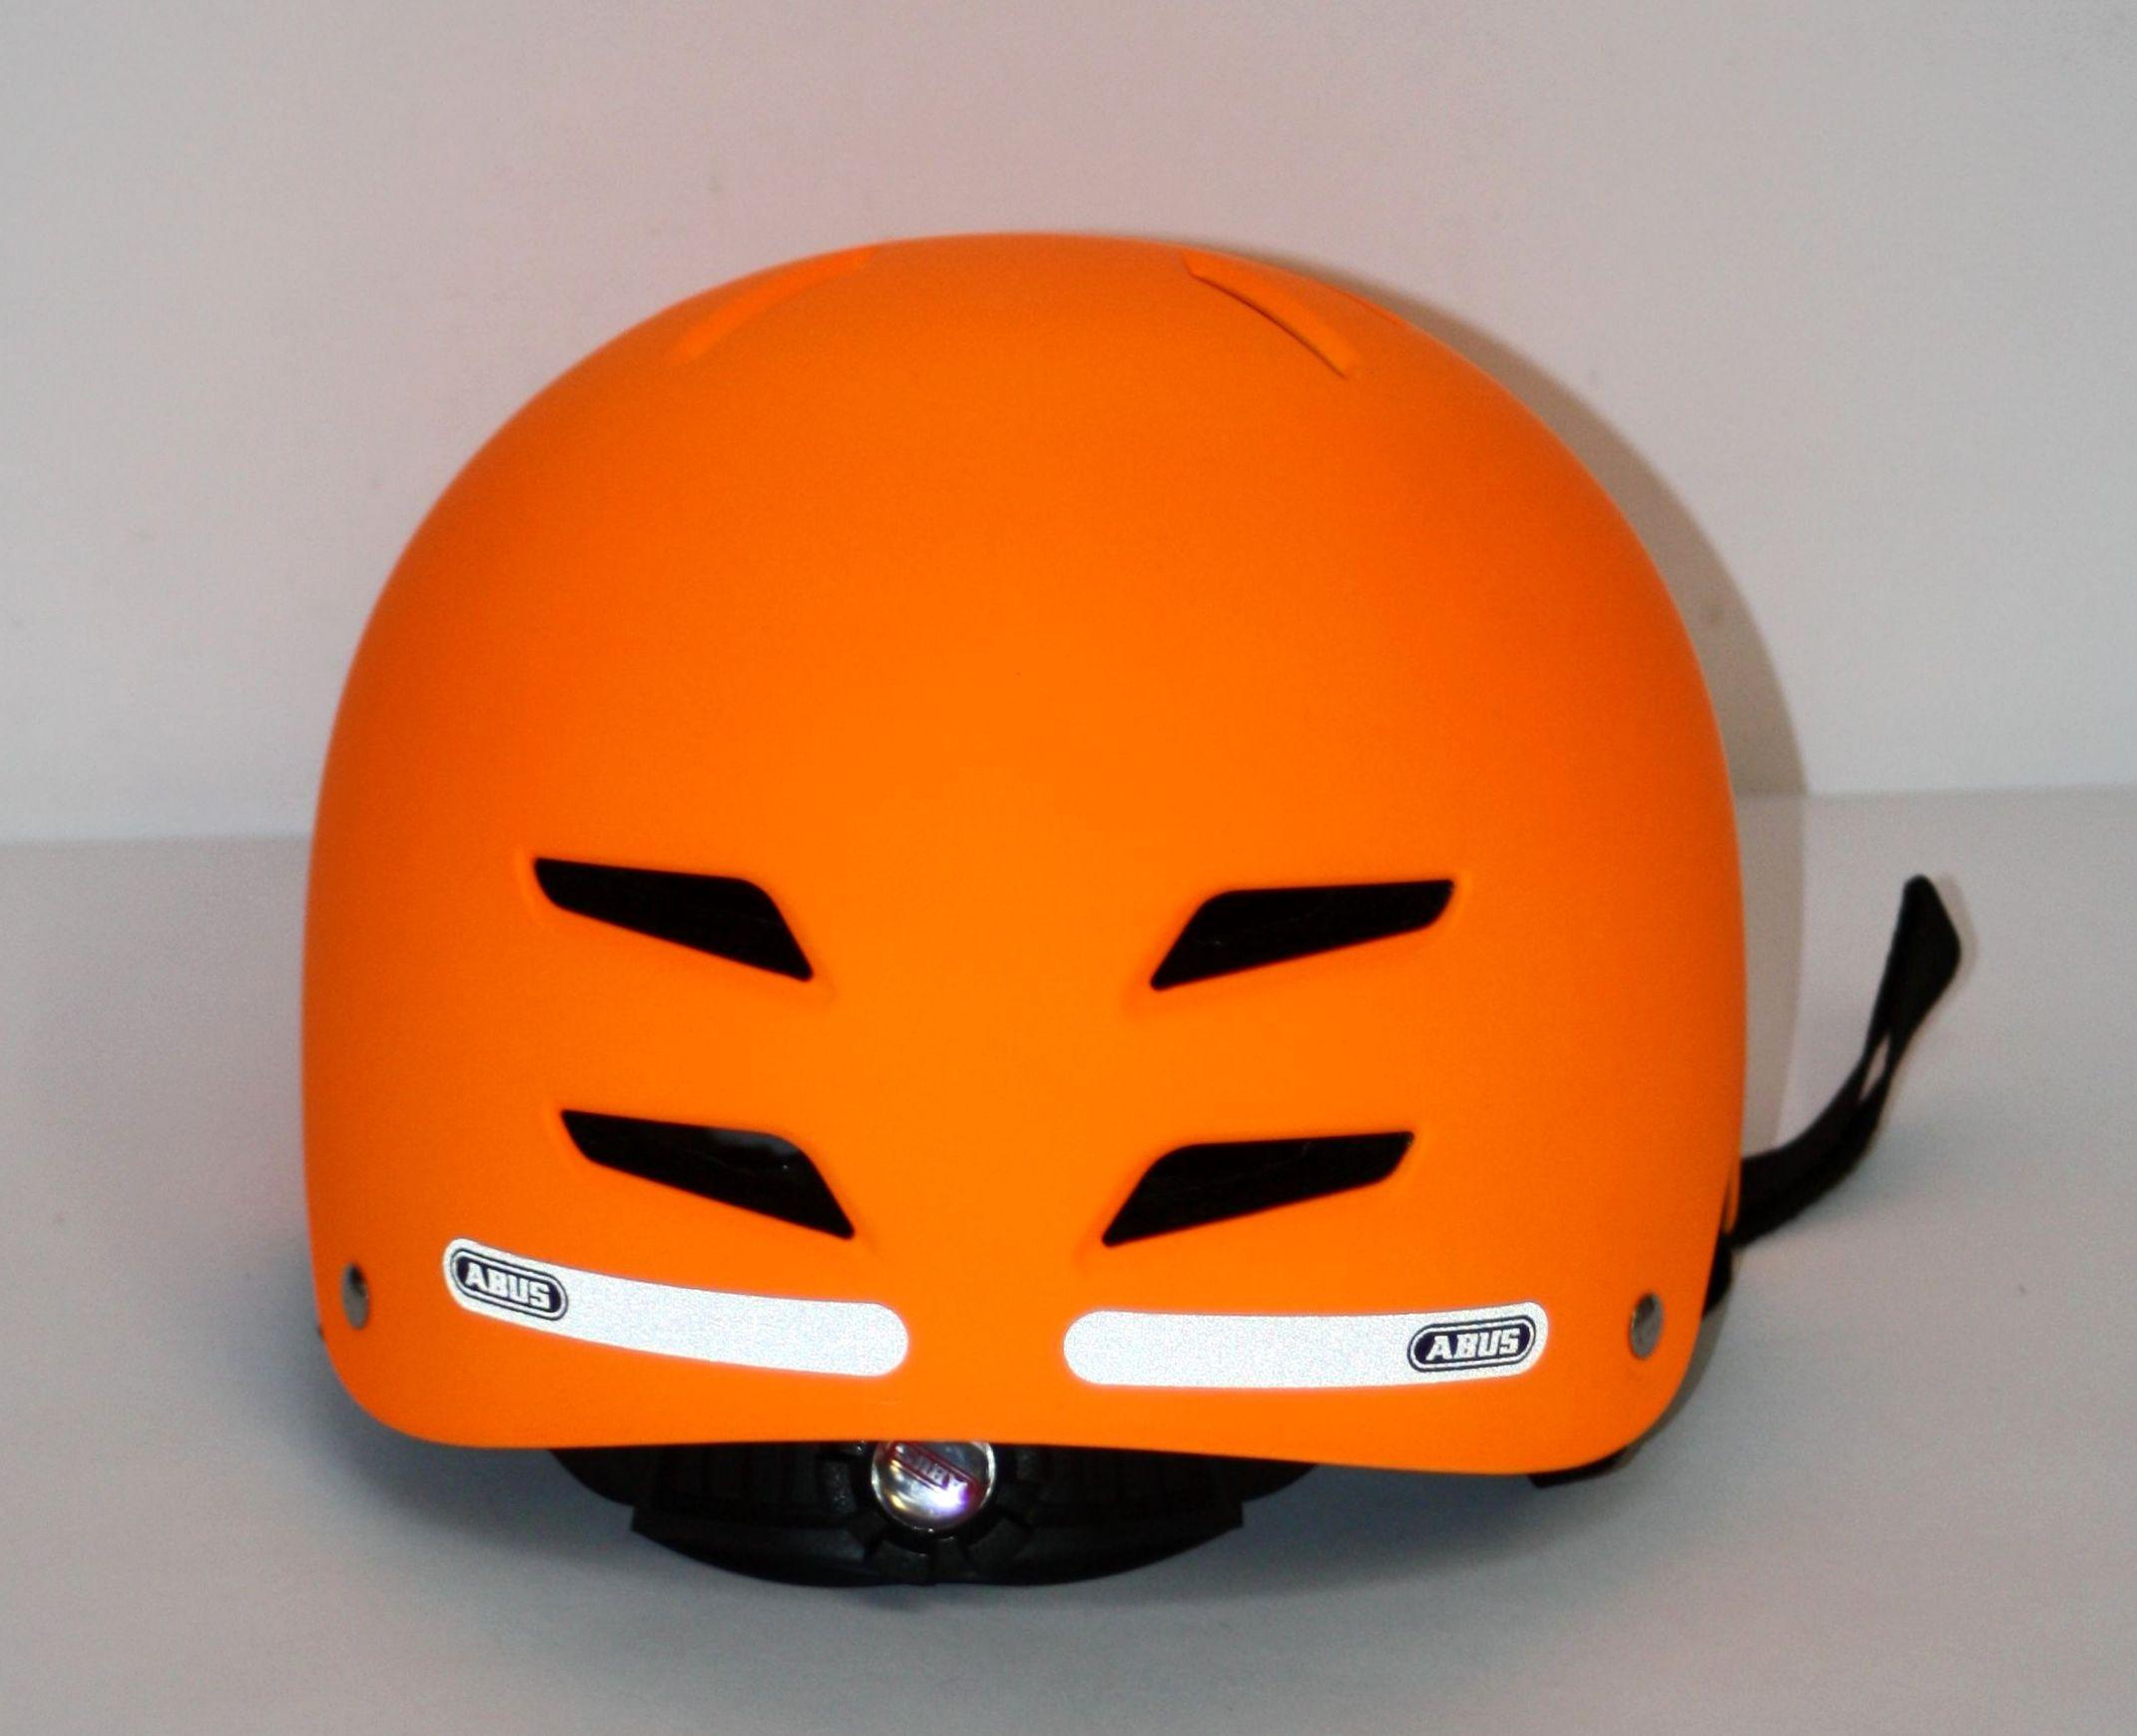 abus kinder fahrradhelm scraper signal orange 51 55 cm. Black Bedroom Furniture Sets. Home Design Ideas